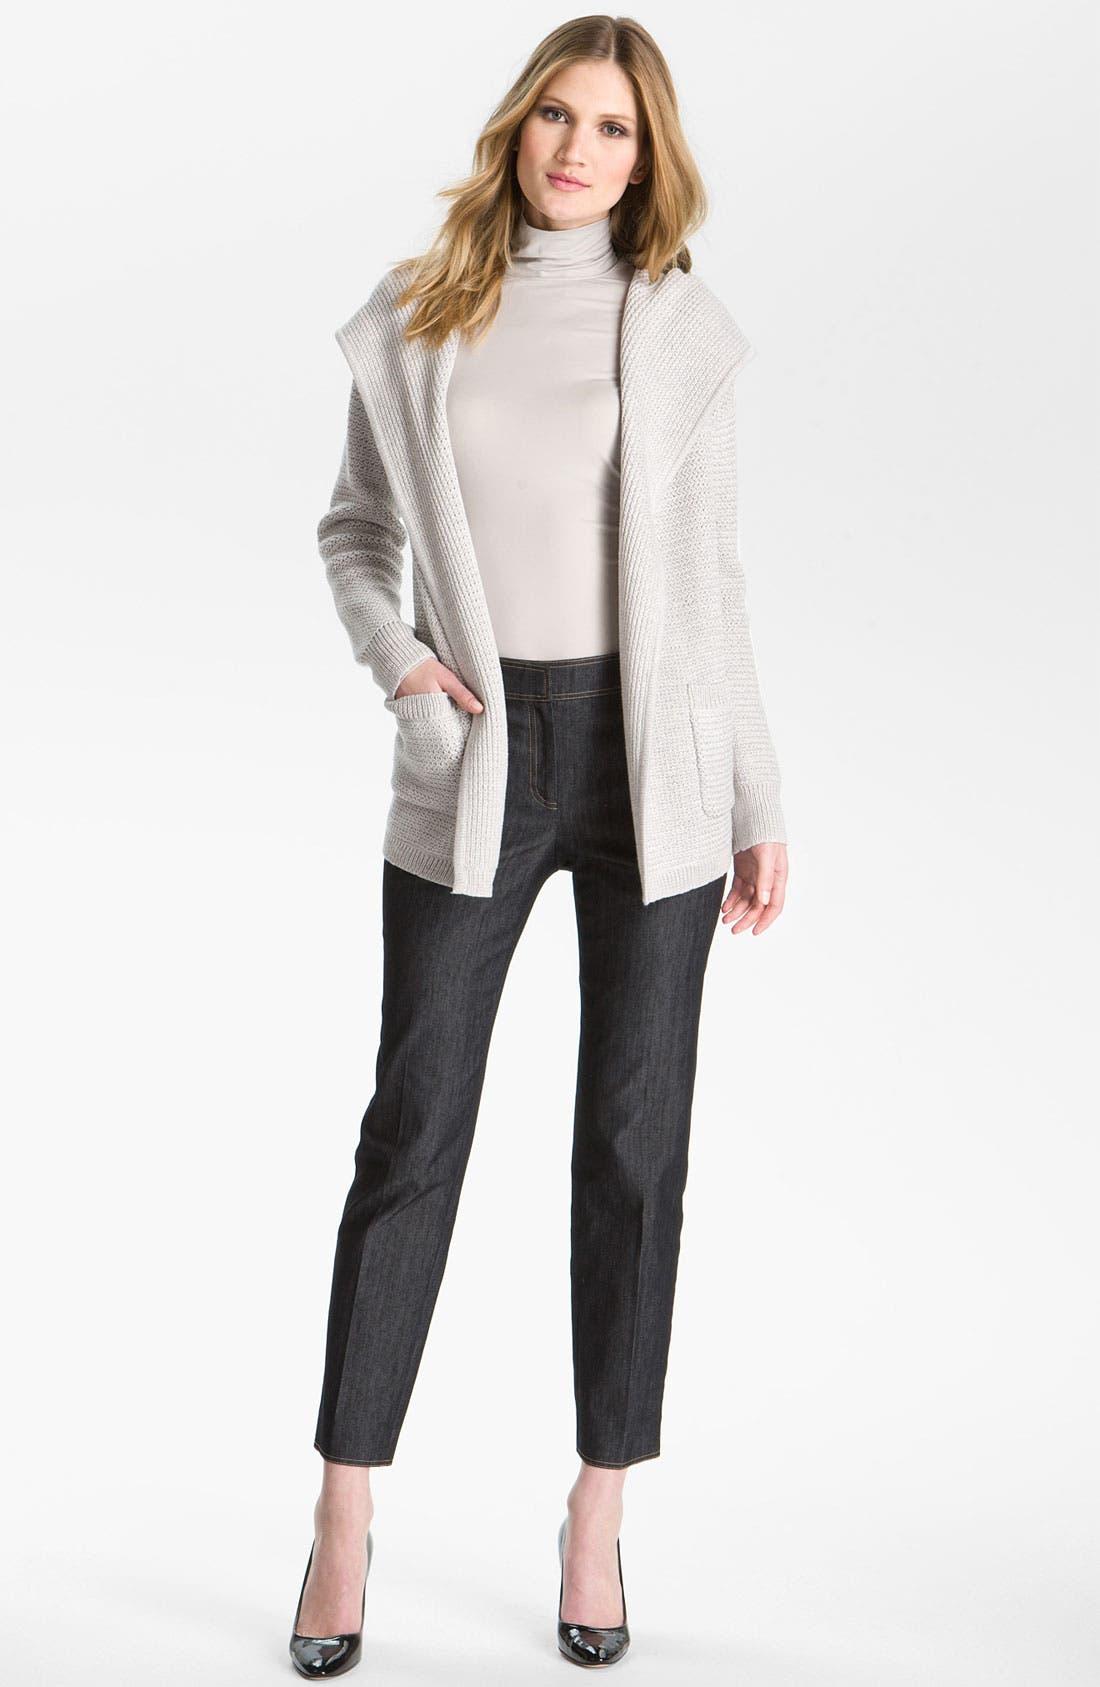 Alternate Image 1 Selected - St. John Yellow Label Hooded Sweater Jacket